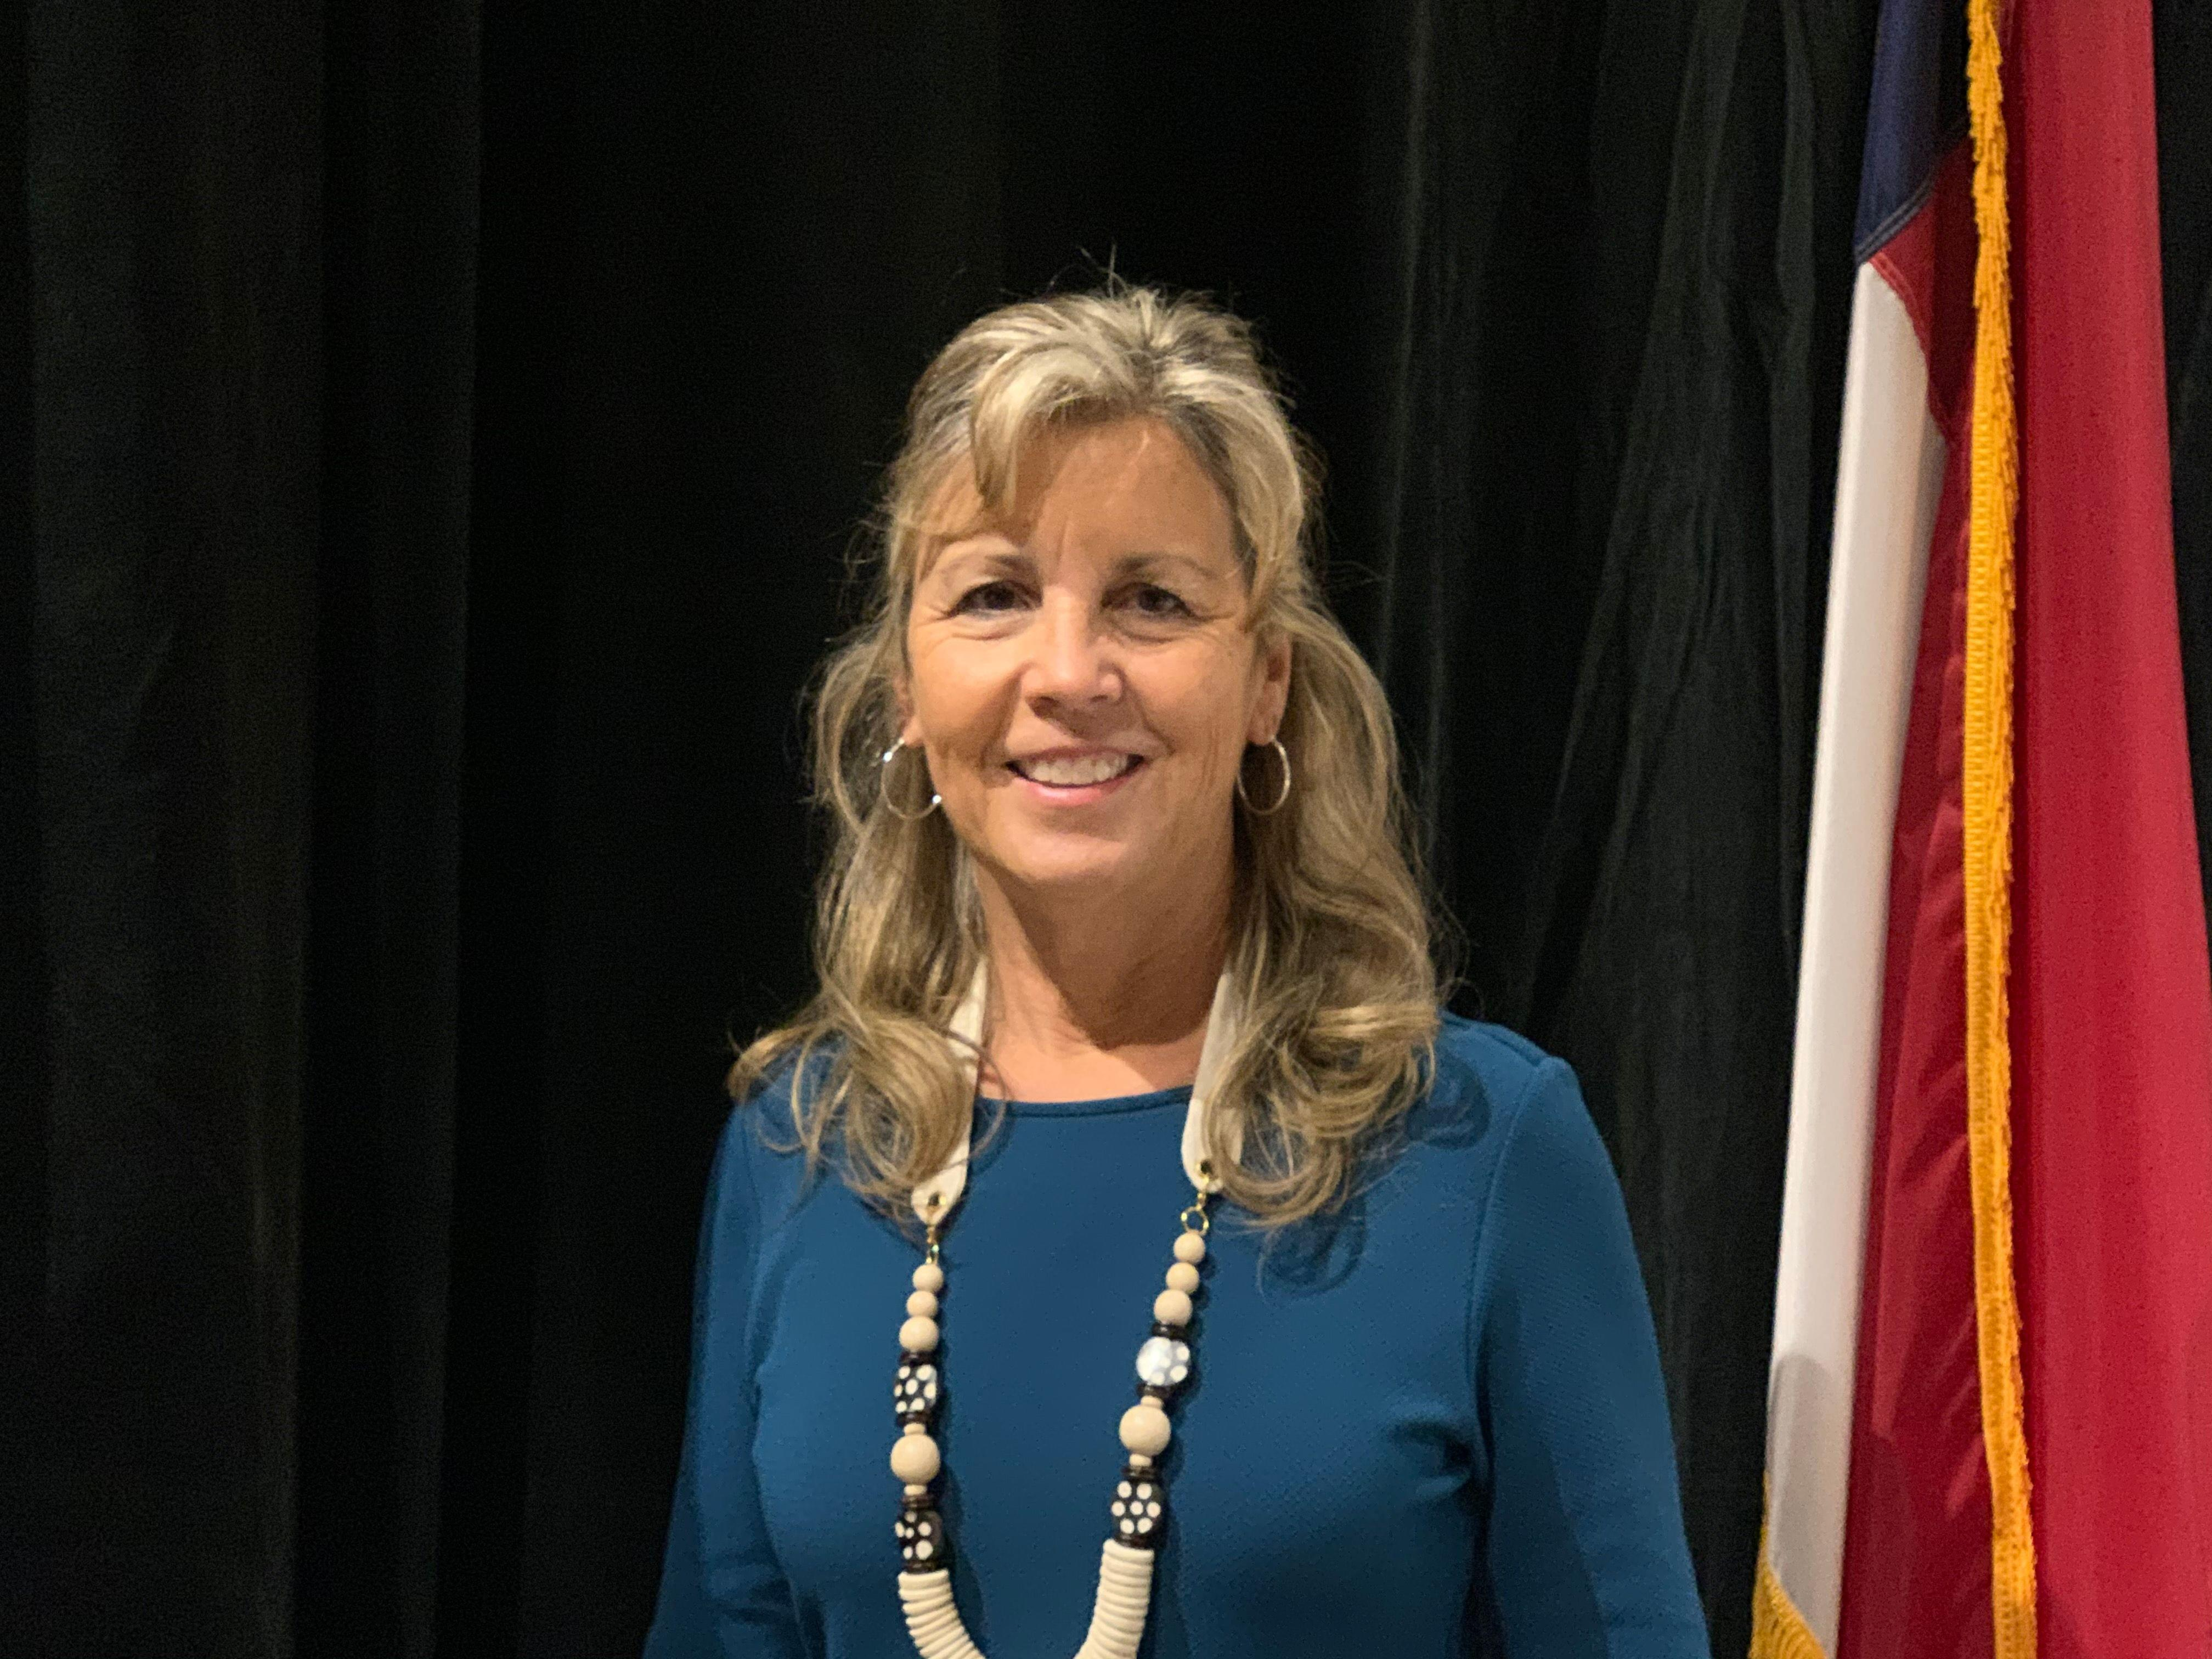 Wayne County Farm Bureau Leader Elected To National Office